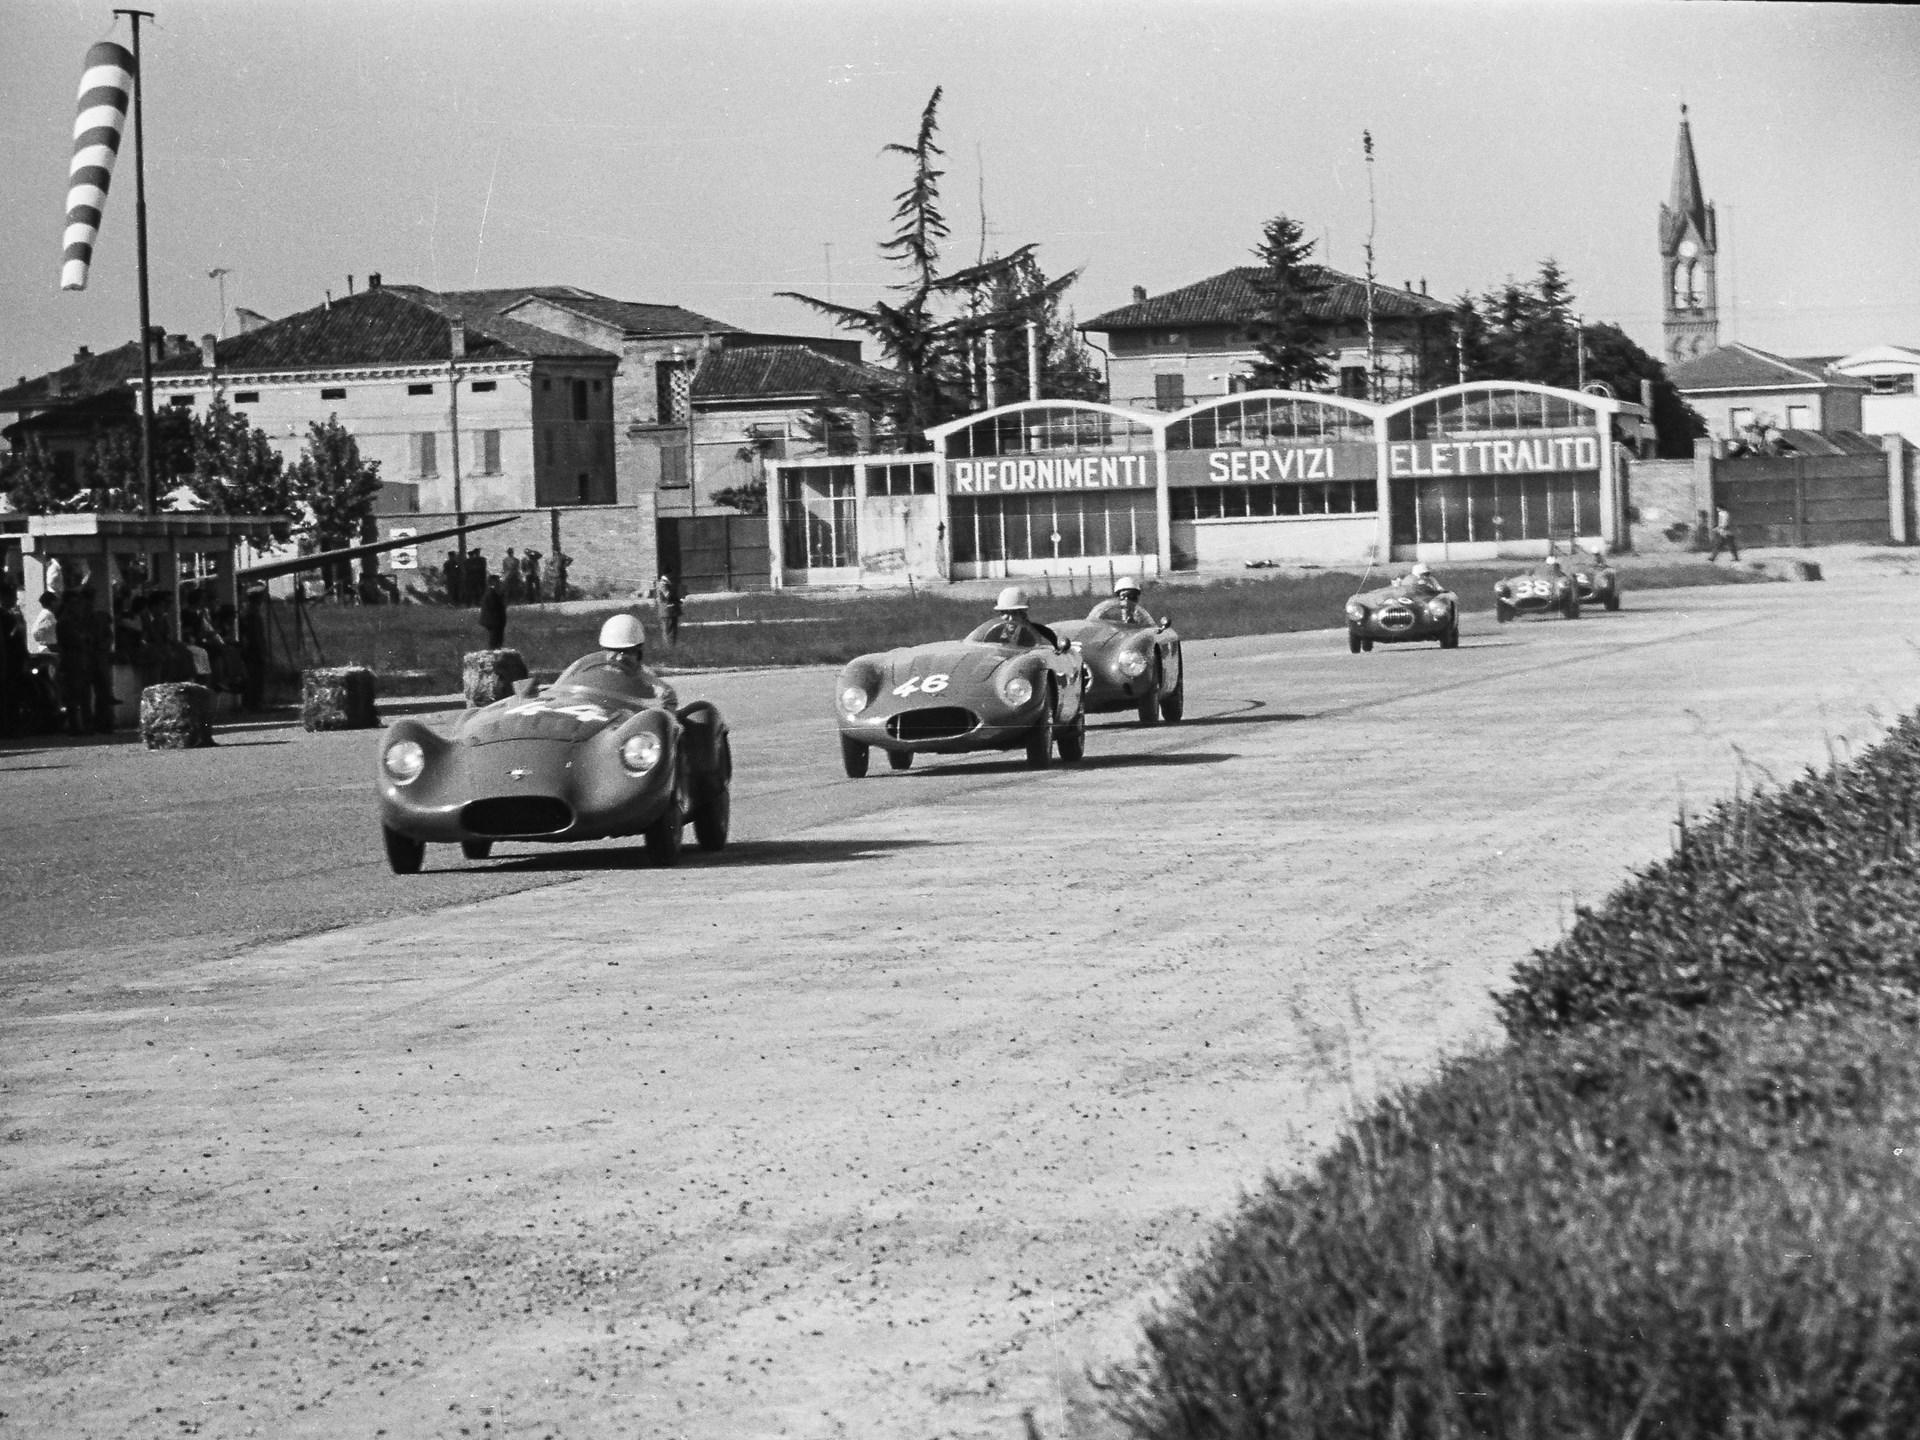 The OSCA racing in Modena in 1956.